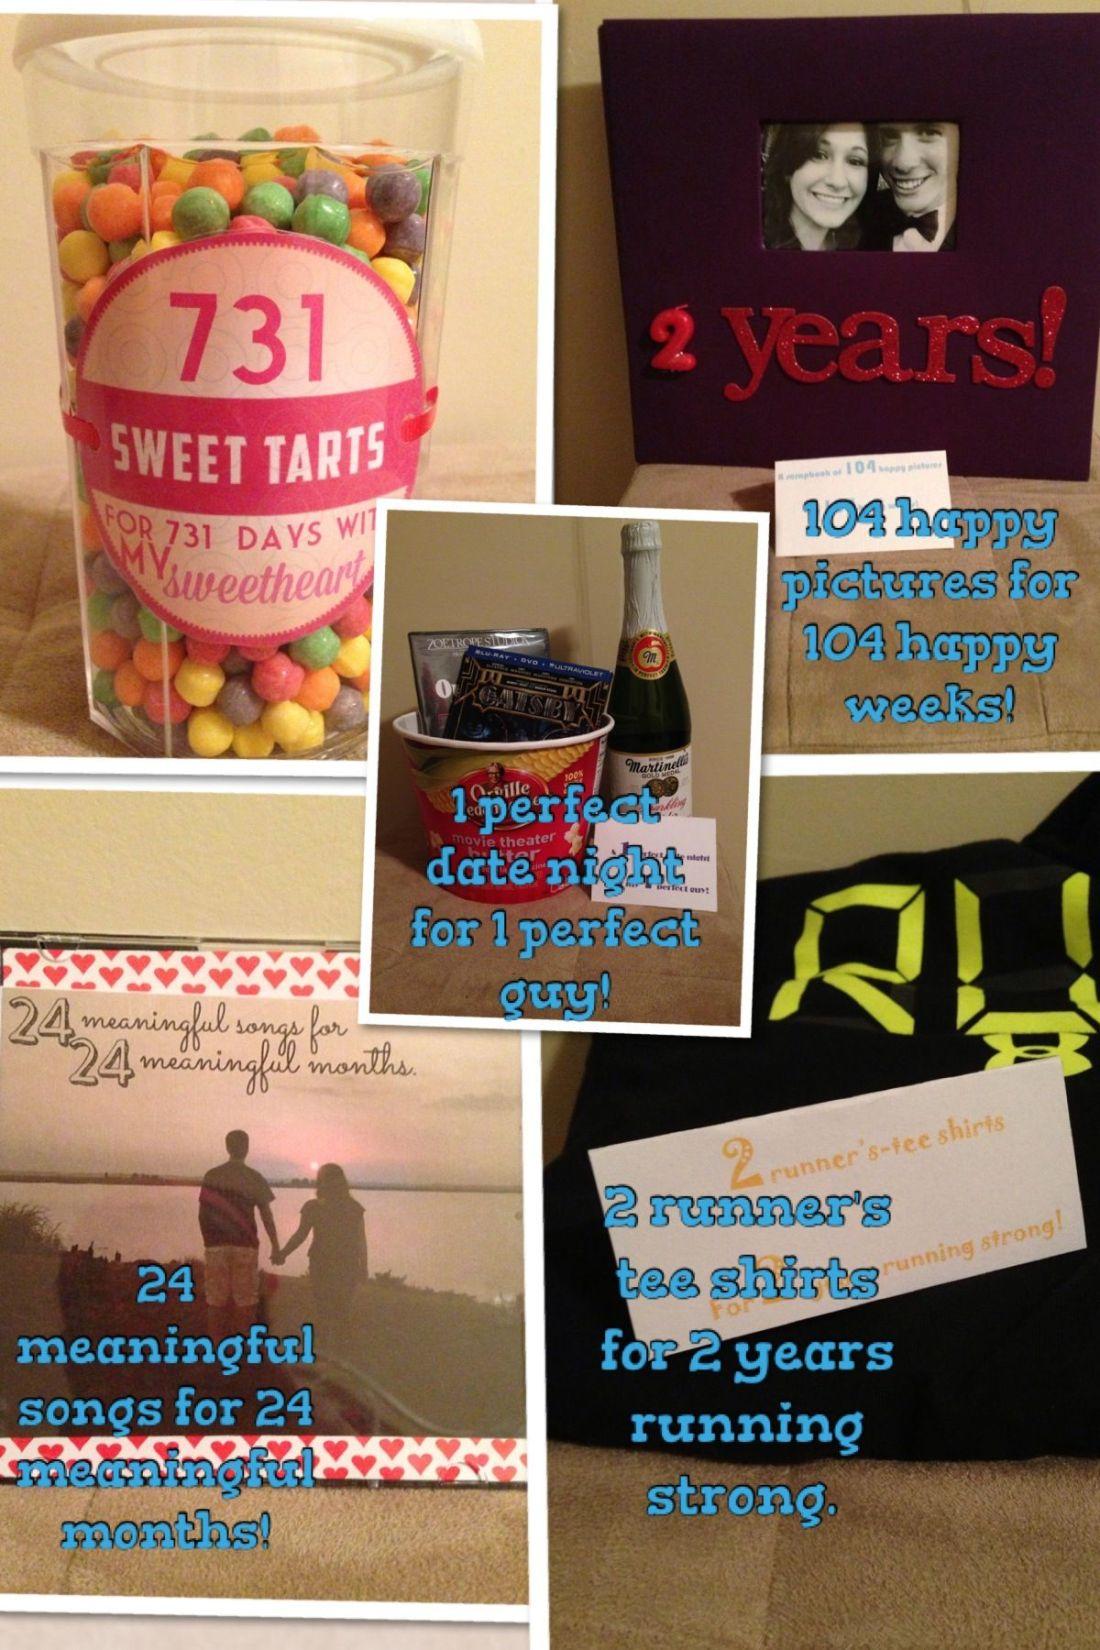 2 year anniversary for my boyfriend gift ideas so